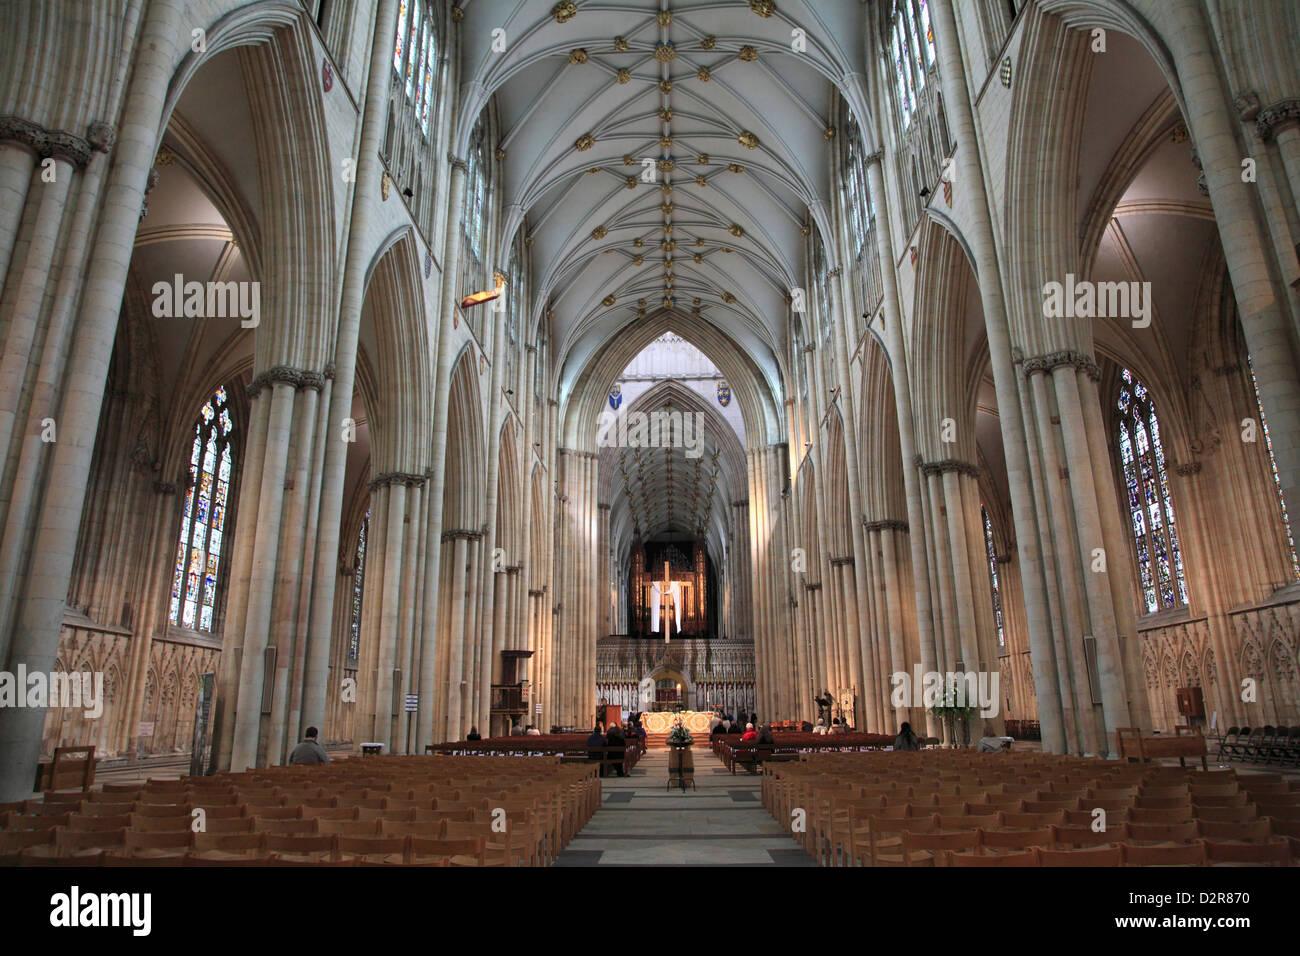 La cathédrale de York, York, Yorkshire, Angleterre, Royaume-Uni, Europe Photo Stock